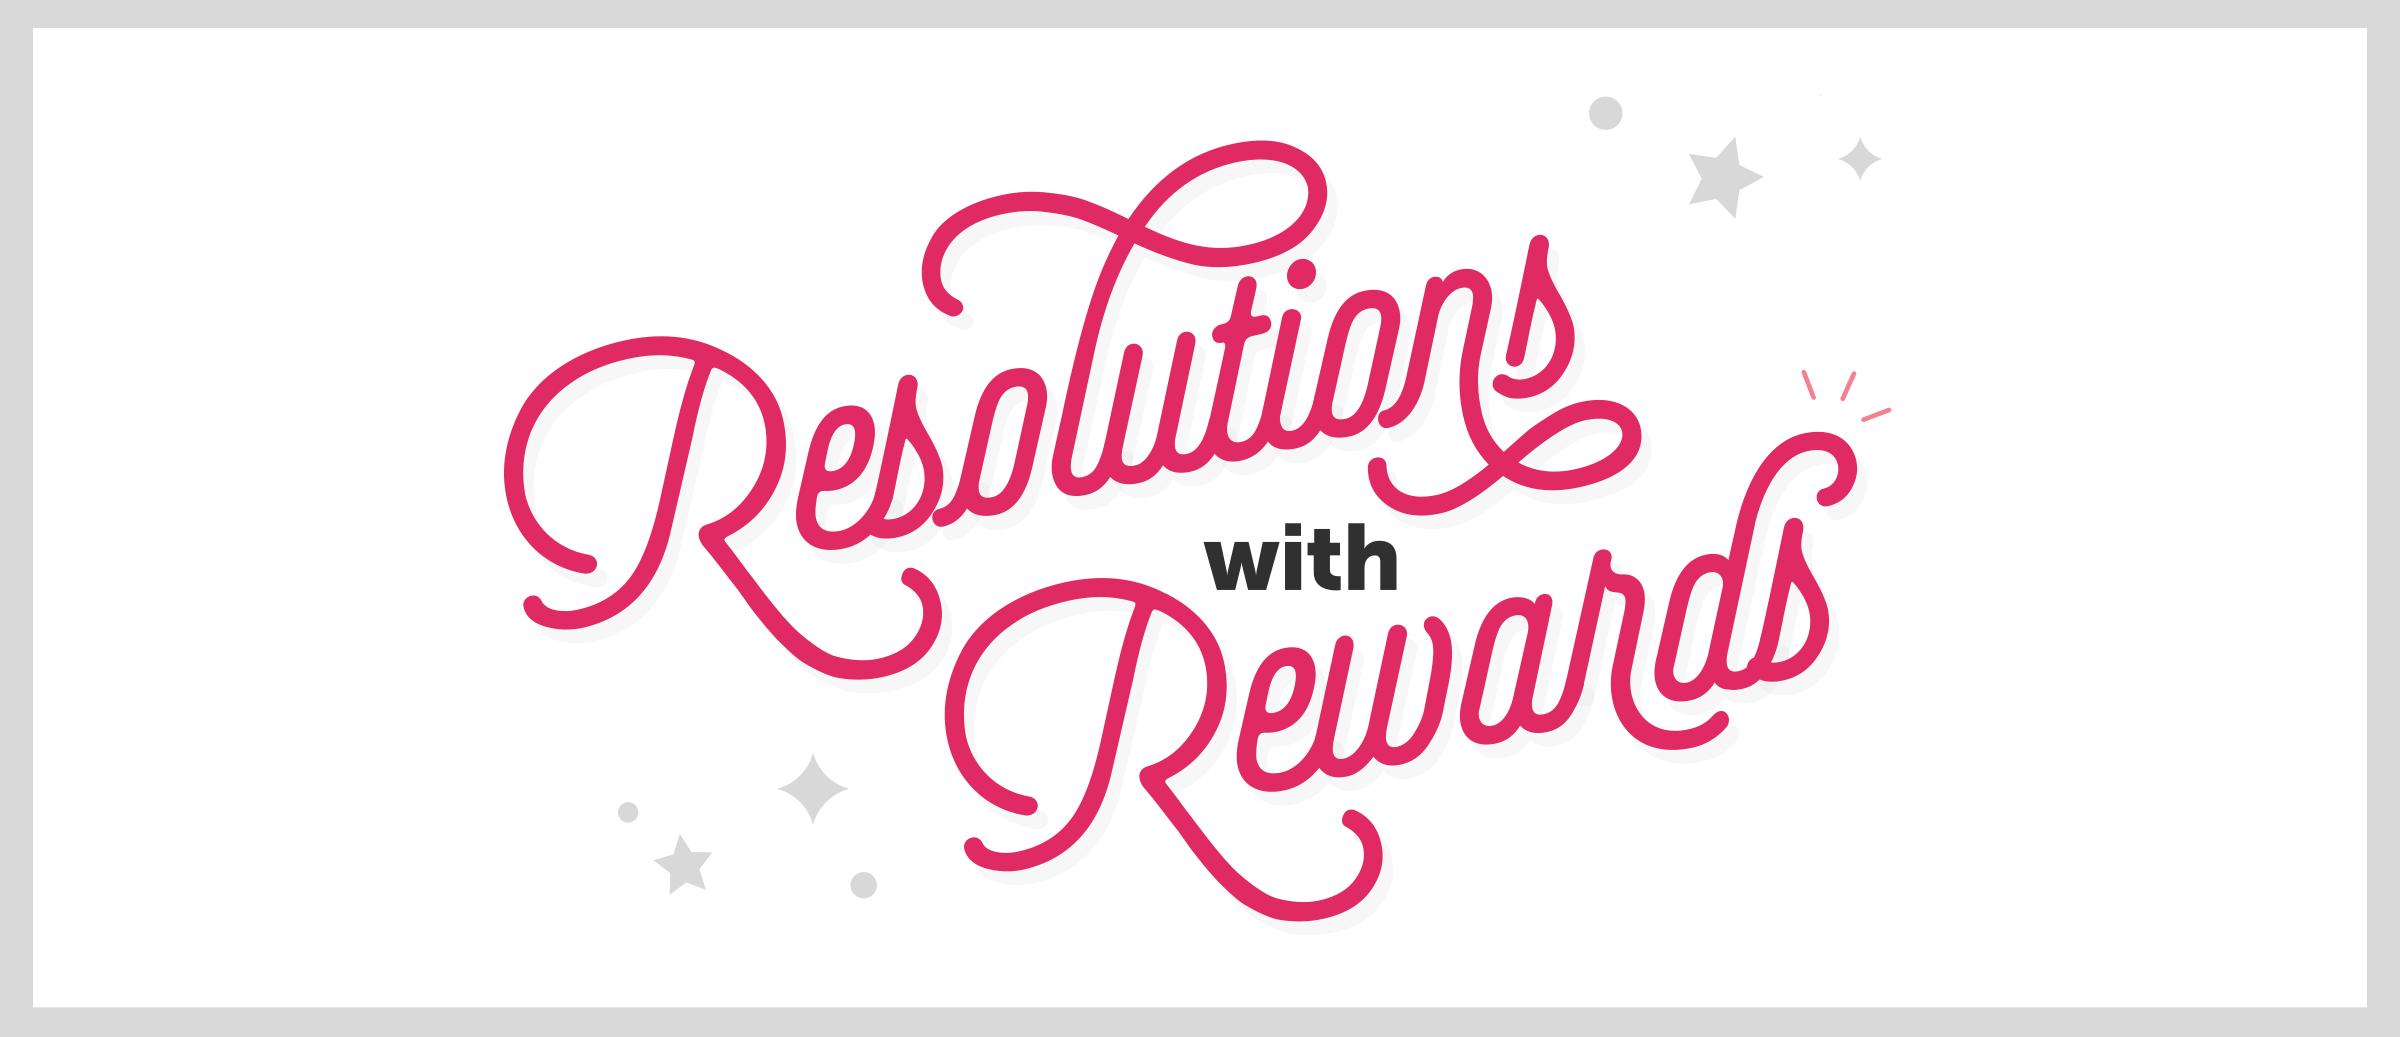 Seasonal_event_web_headers_RWR